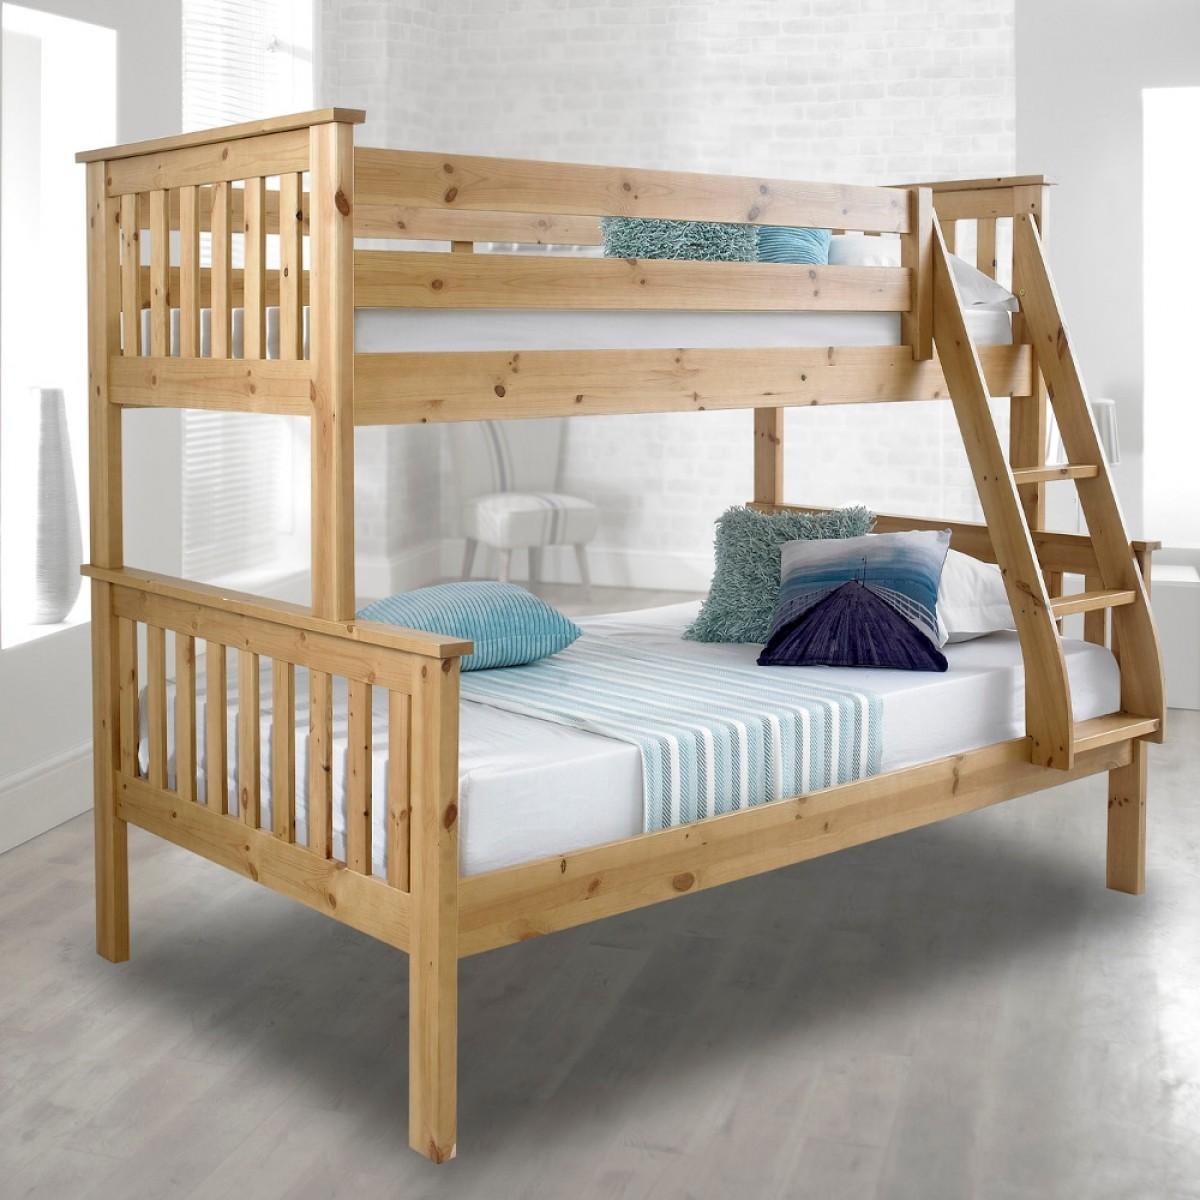 3ft Single Triple sleeper Bunk Bed EURO Three sleeper Bunkbed VERY STRONG BUNK